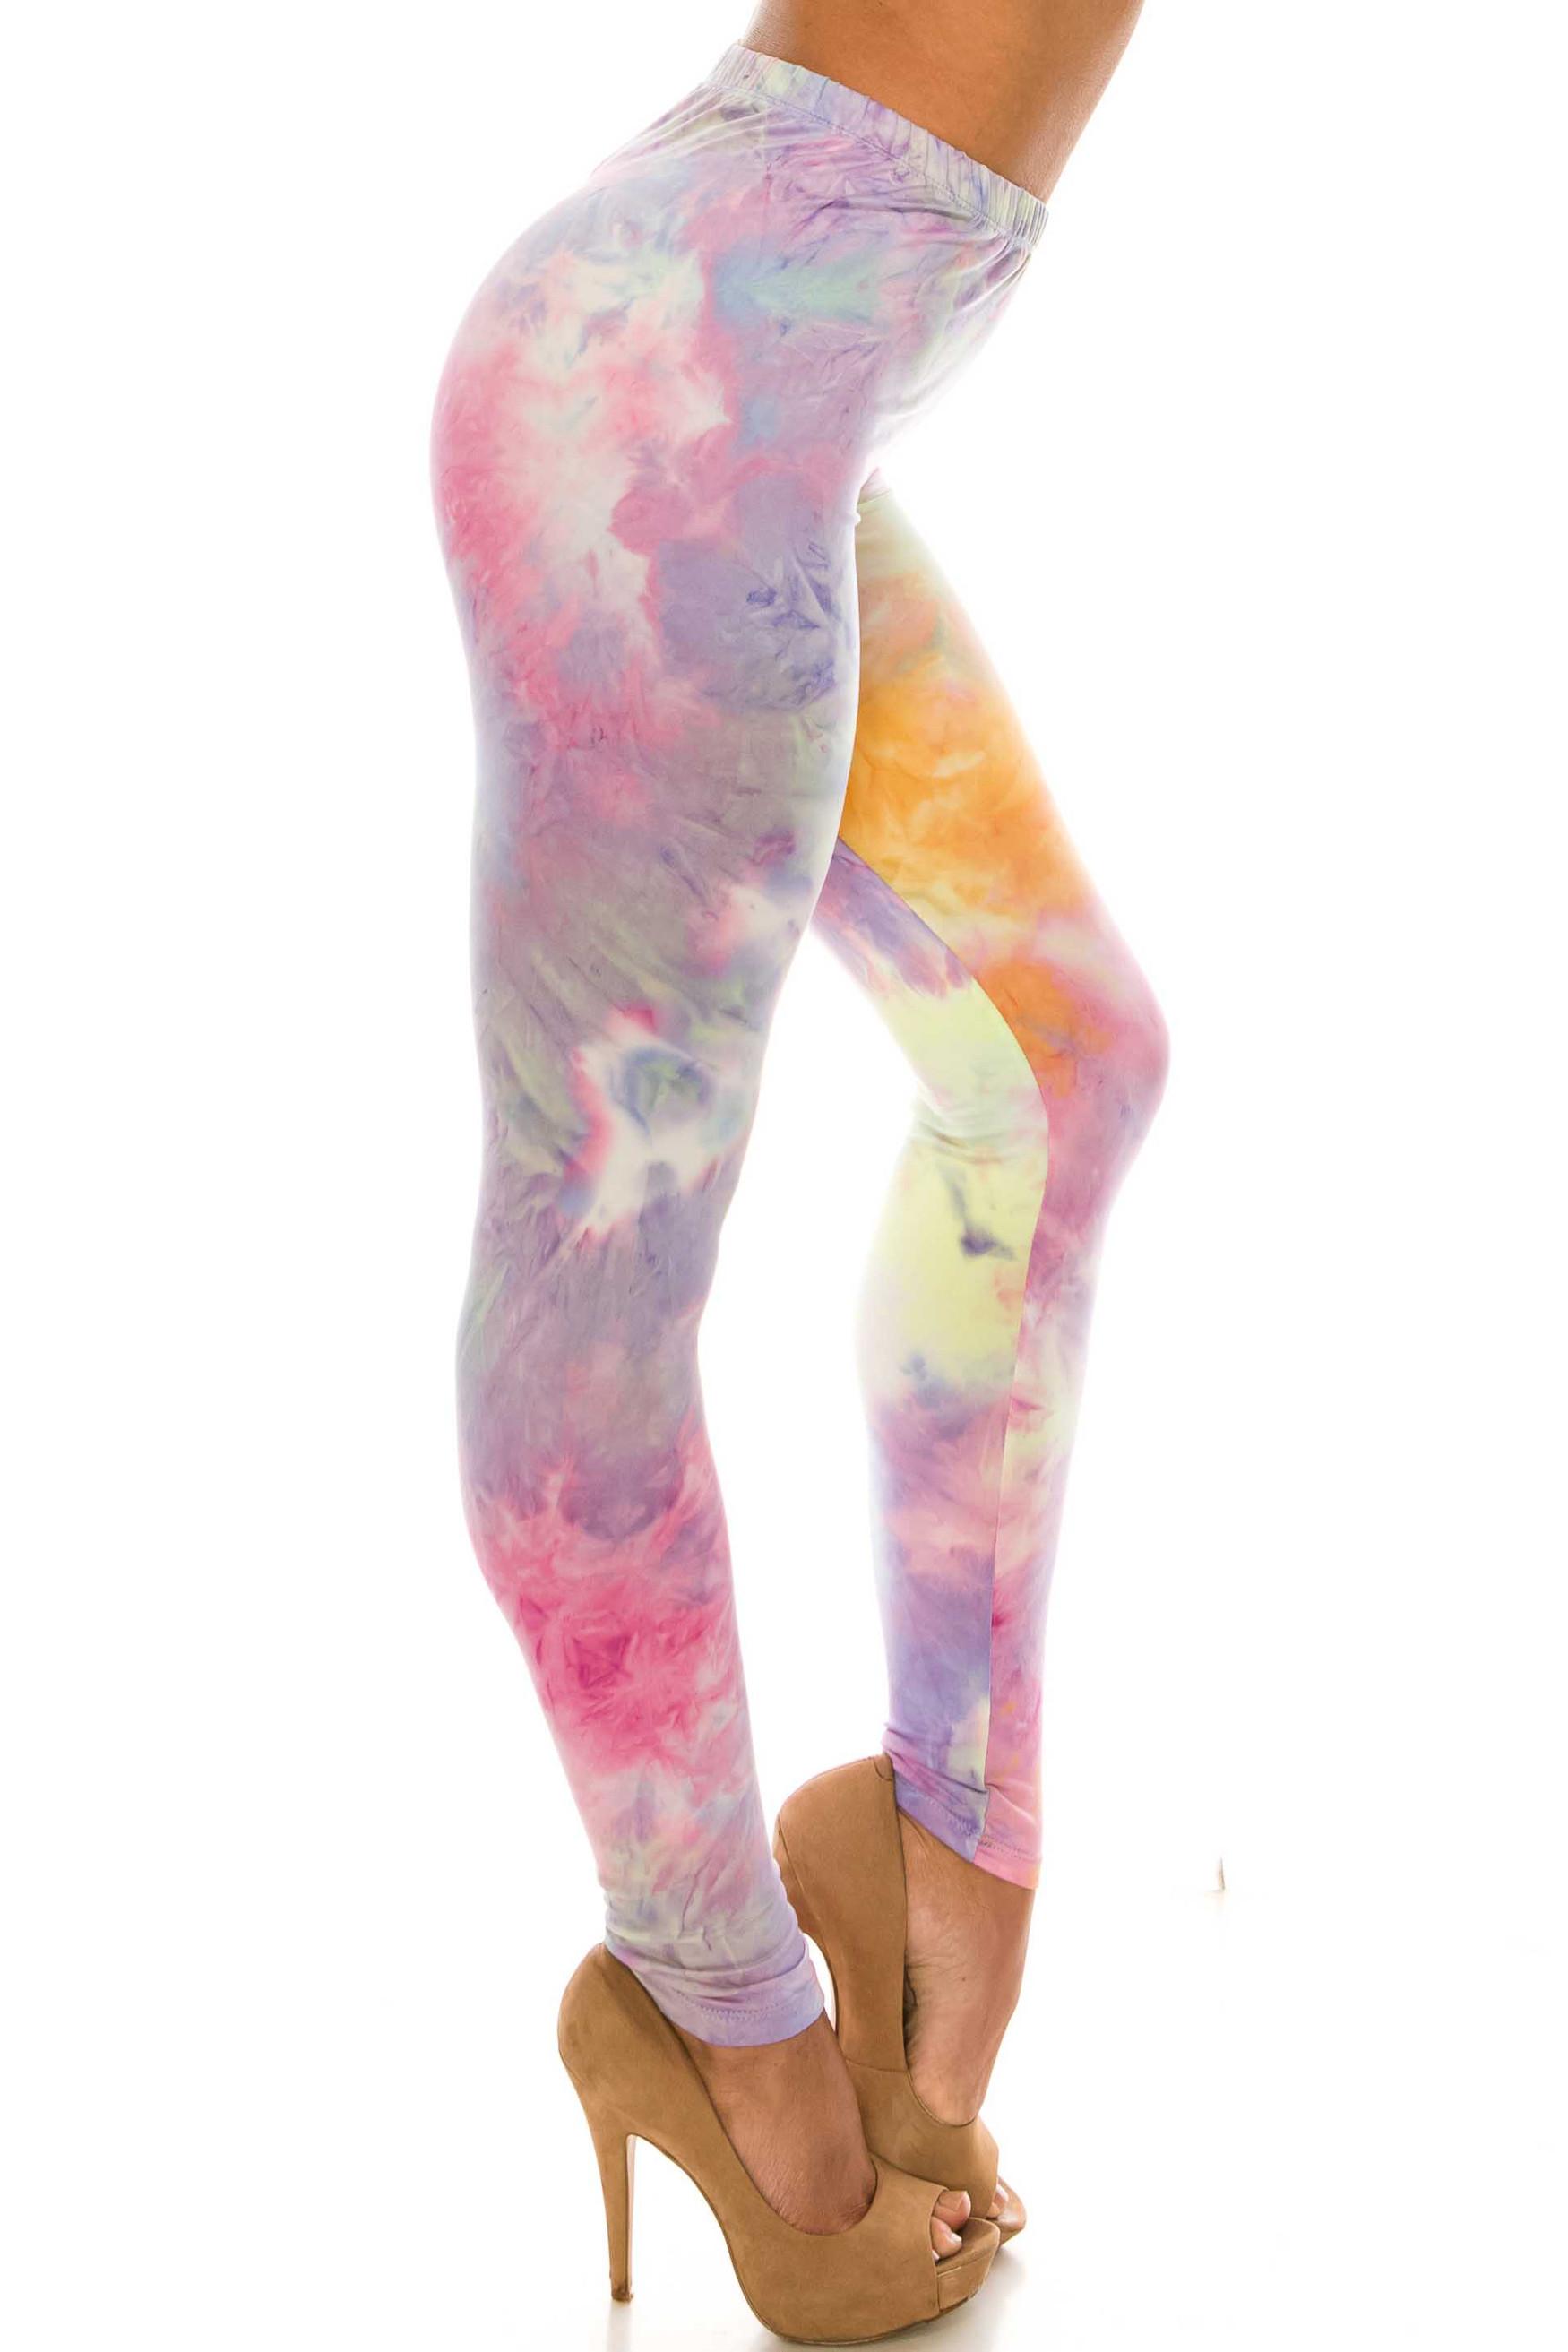 Buttery Soft Multi-Color Pastel Tie Dye Leggings